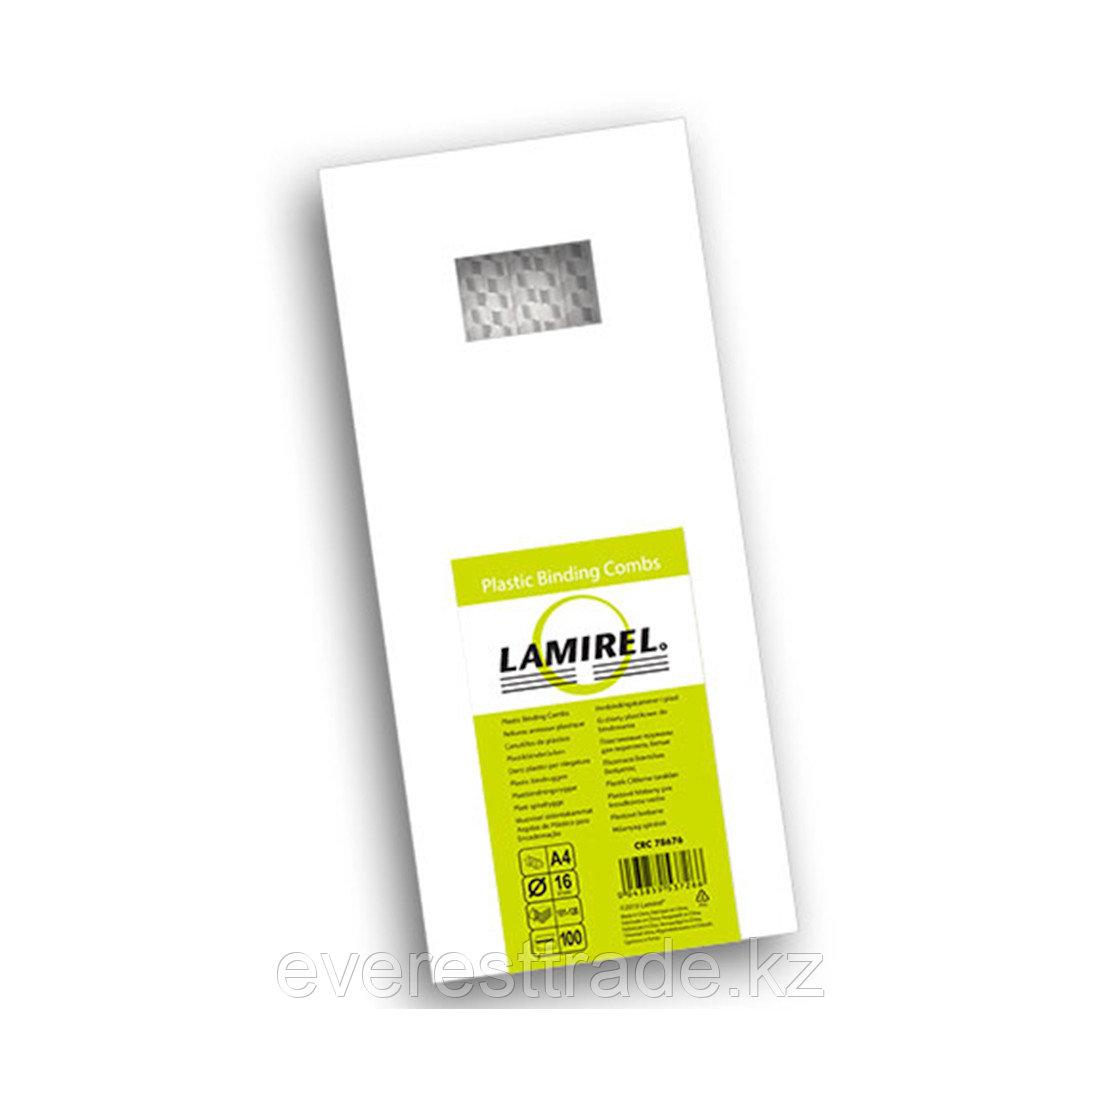 Lamirel Пружина пластиковая, Lamirel LA-78676, 16 мм. Цвет: белый, 100 шт